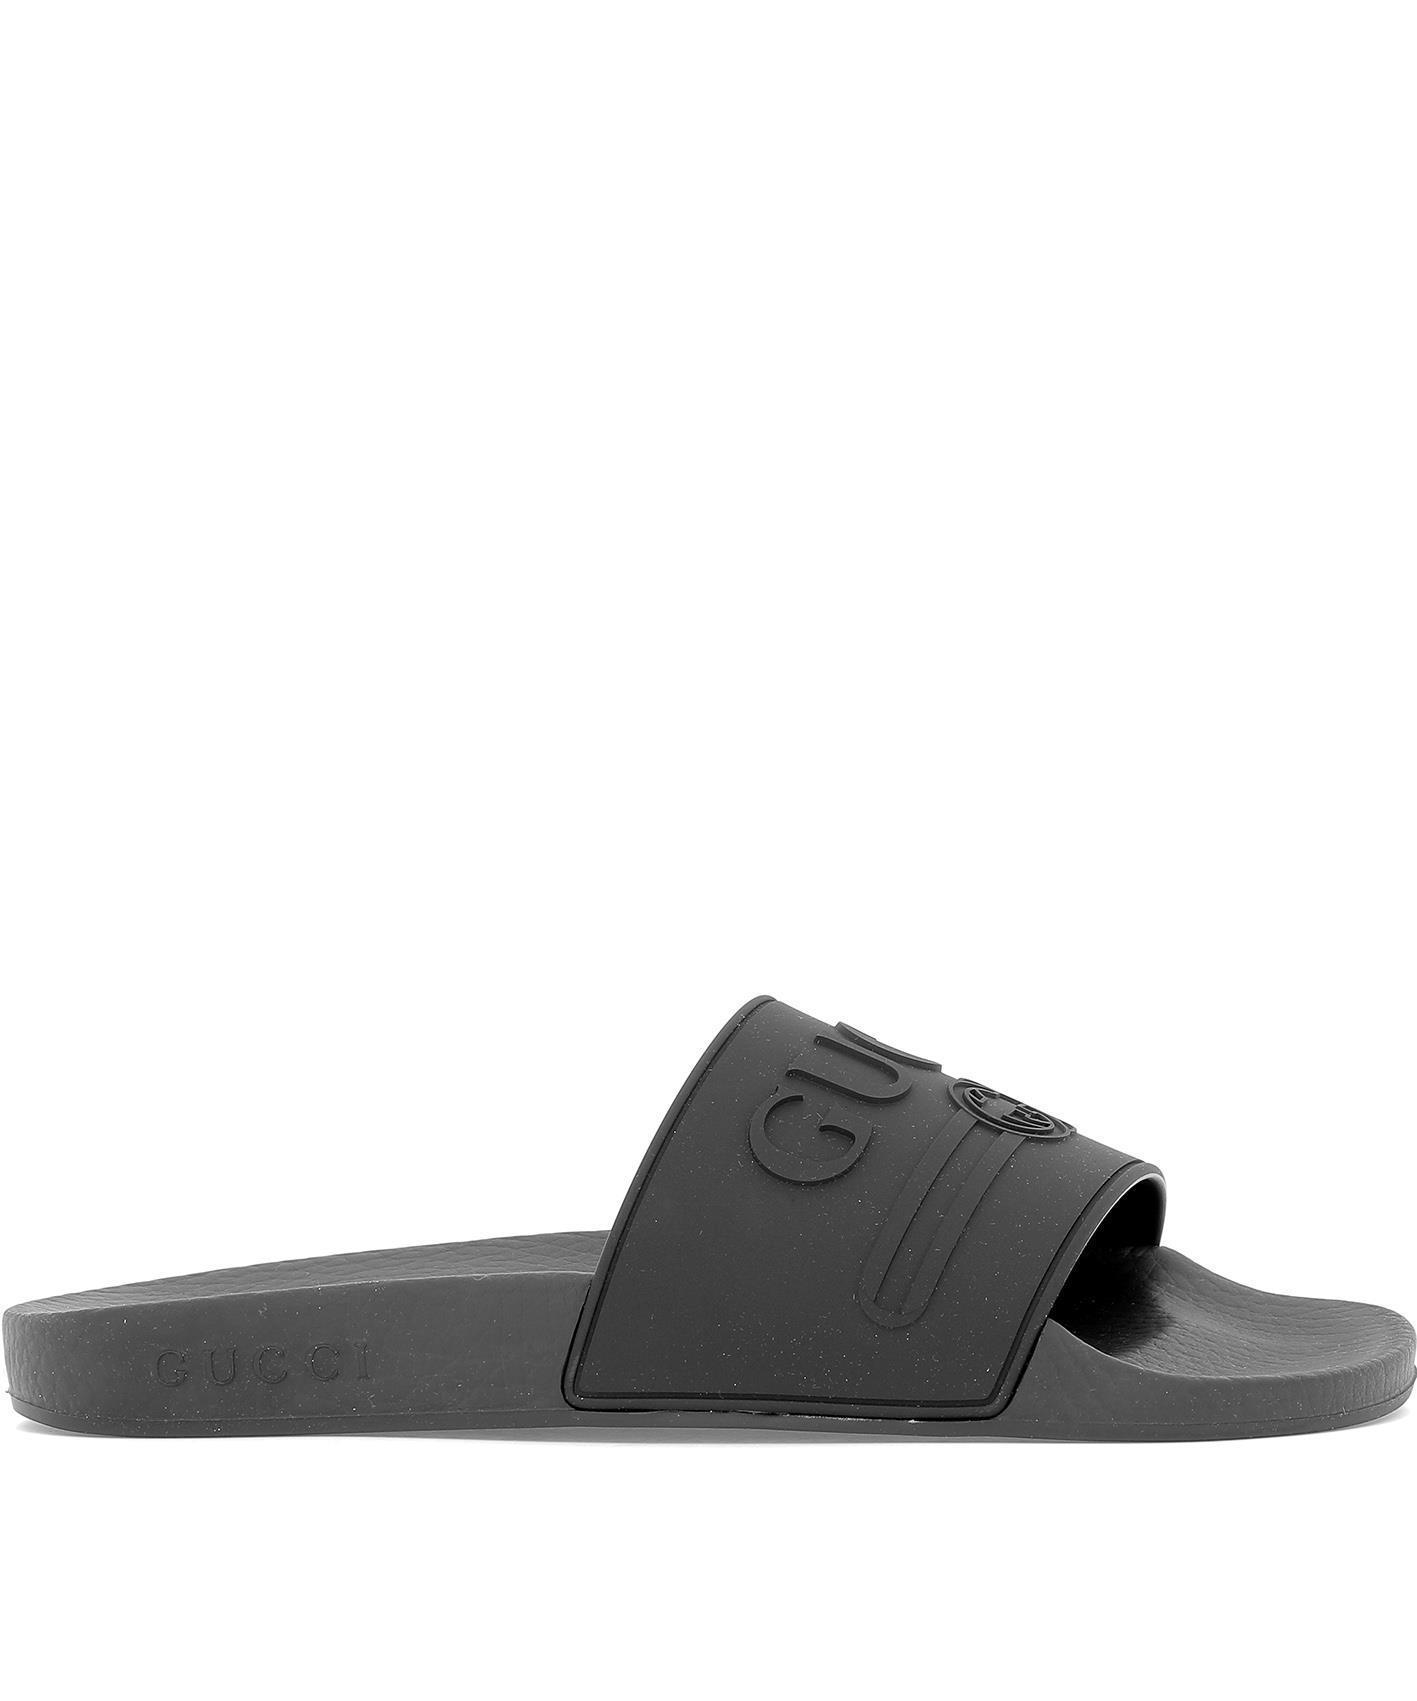 4640d085ddf Lyst - Gucci Logo Slides in Black